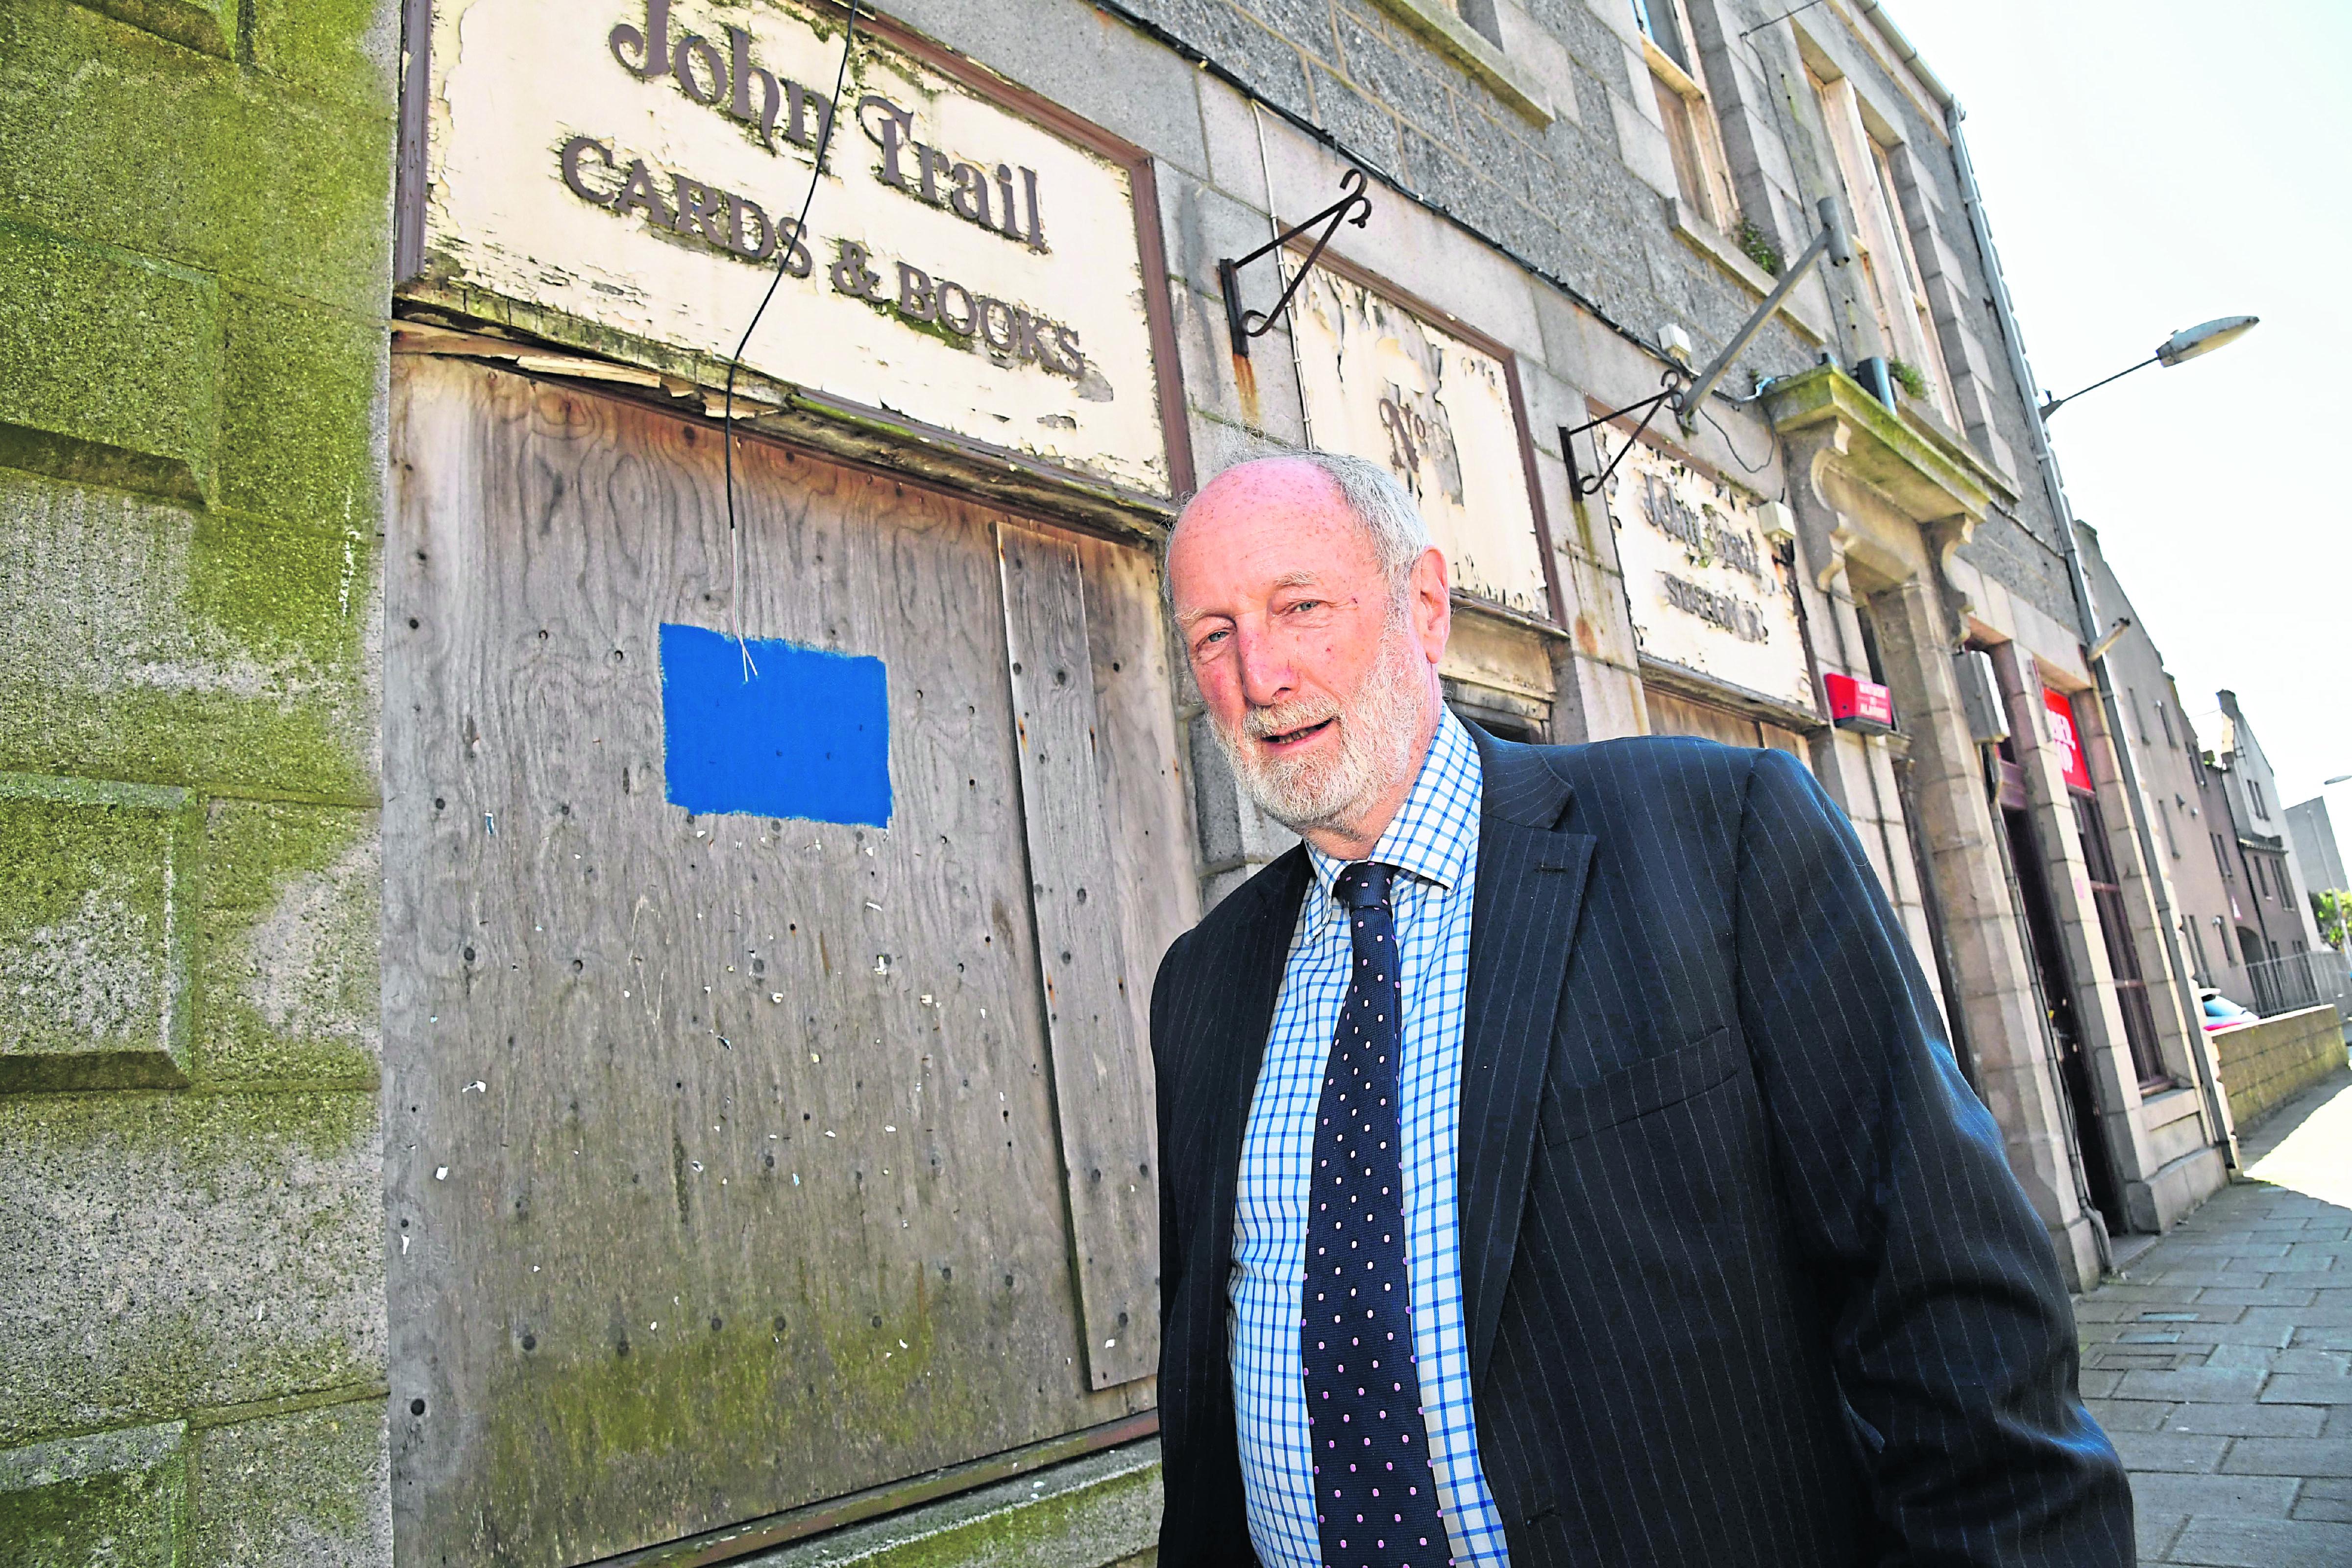 Councillor Charles Buchan at the former John Trail bookshop in Fraserburgh.